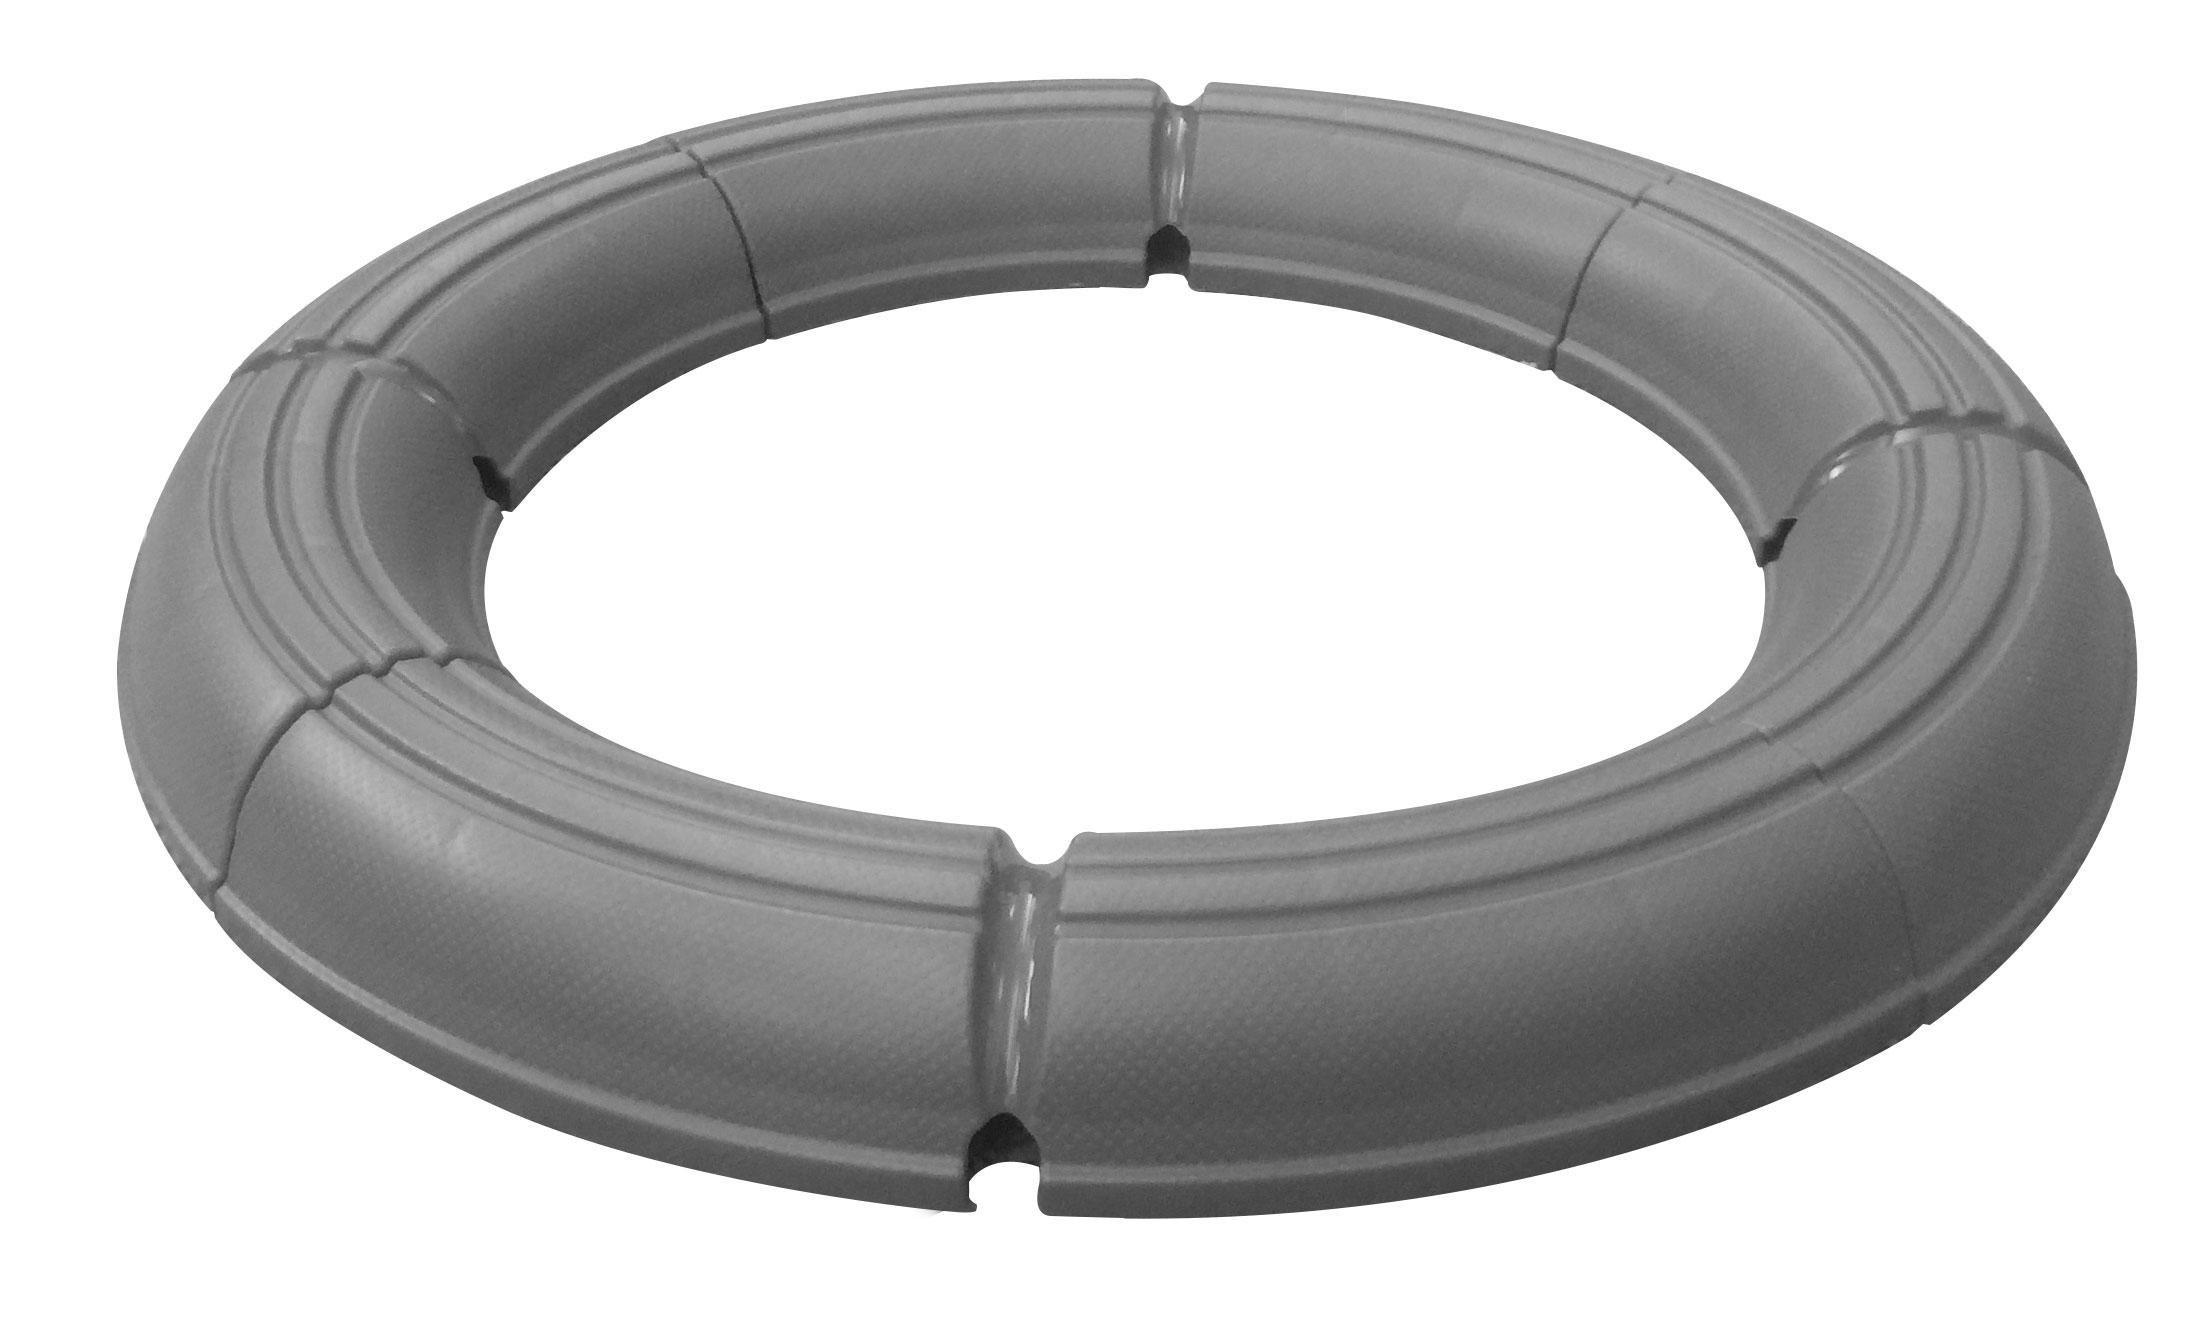 Amazon Gaiam Balance Ball Stability Ring Grey Sports